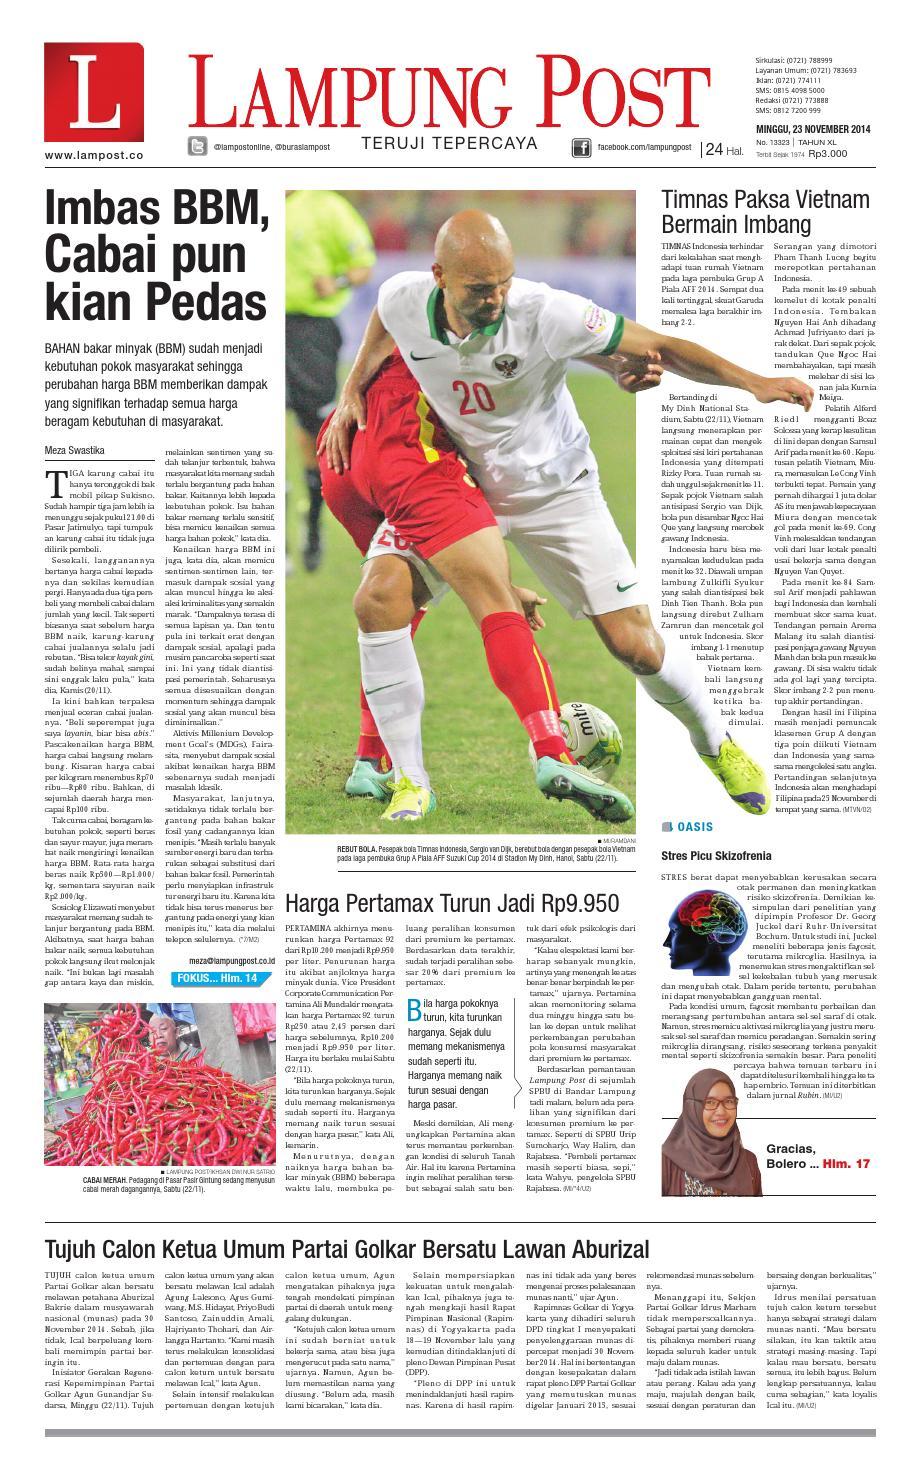 Lampung Post Minggu 23 November 2014 By Issuu Produk Ukm Bumn Bahan Songket Sulam Katun Merah